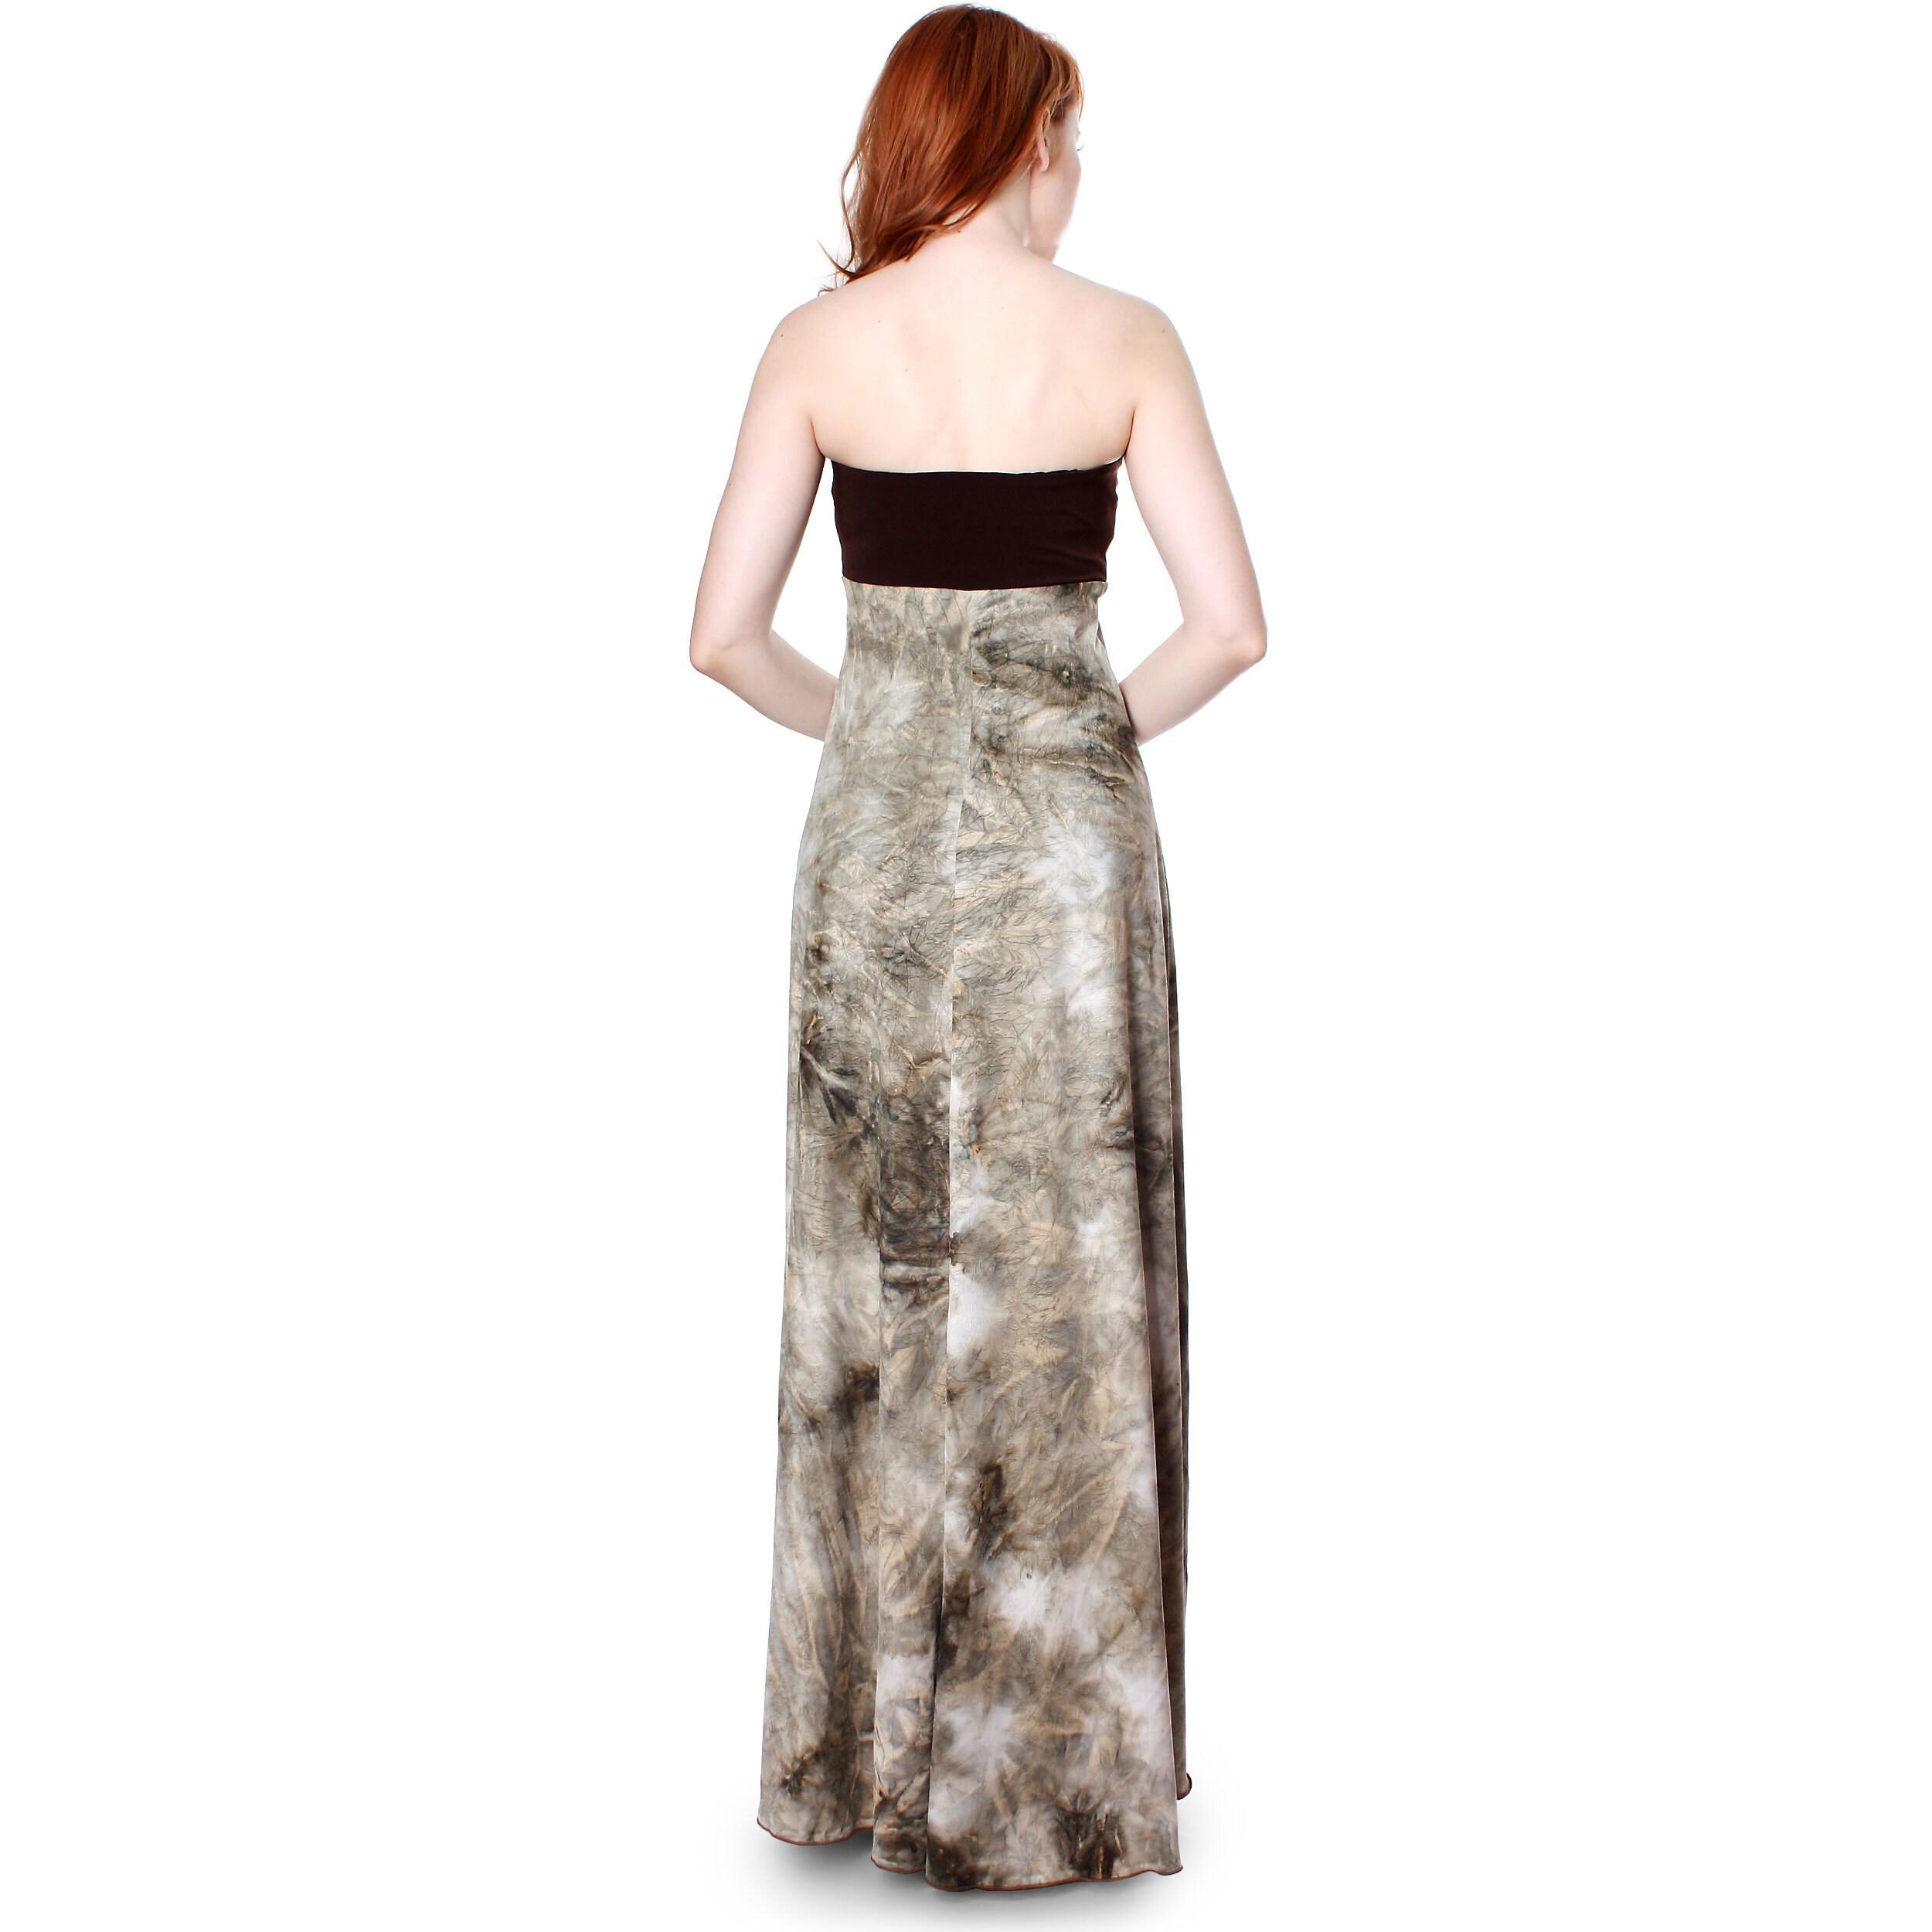 773641043fd Evanese Women s Summer Cocktail Strapless Tube Tie dye Print Maxi Long Dress